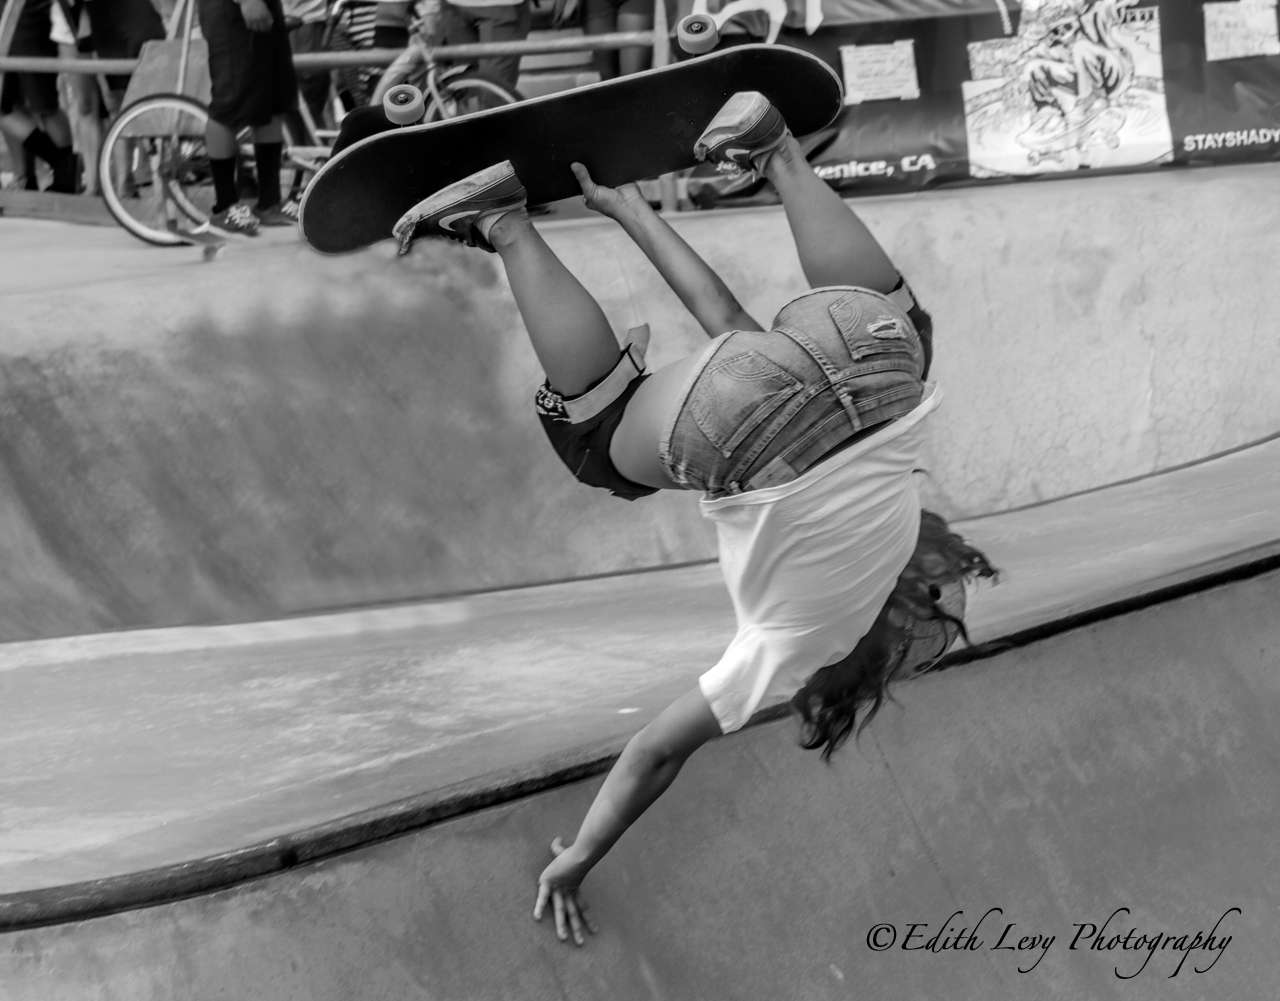 Venice Beach, California, skateboard, photo